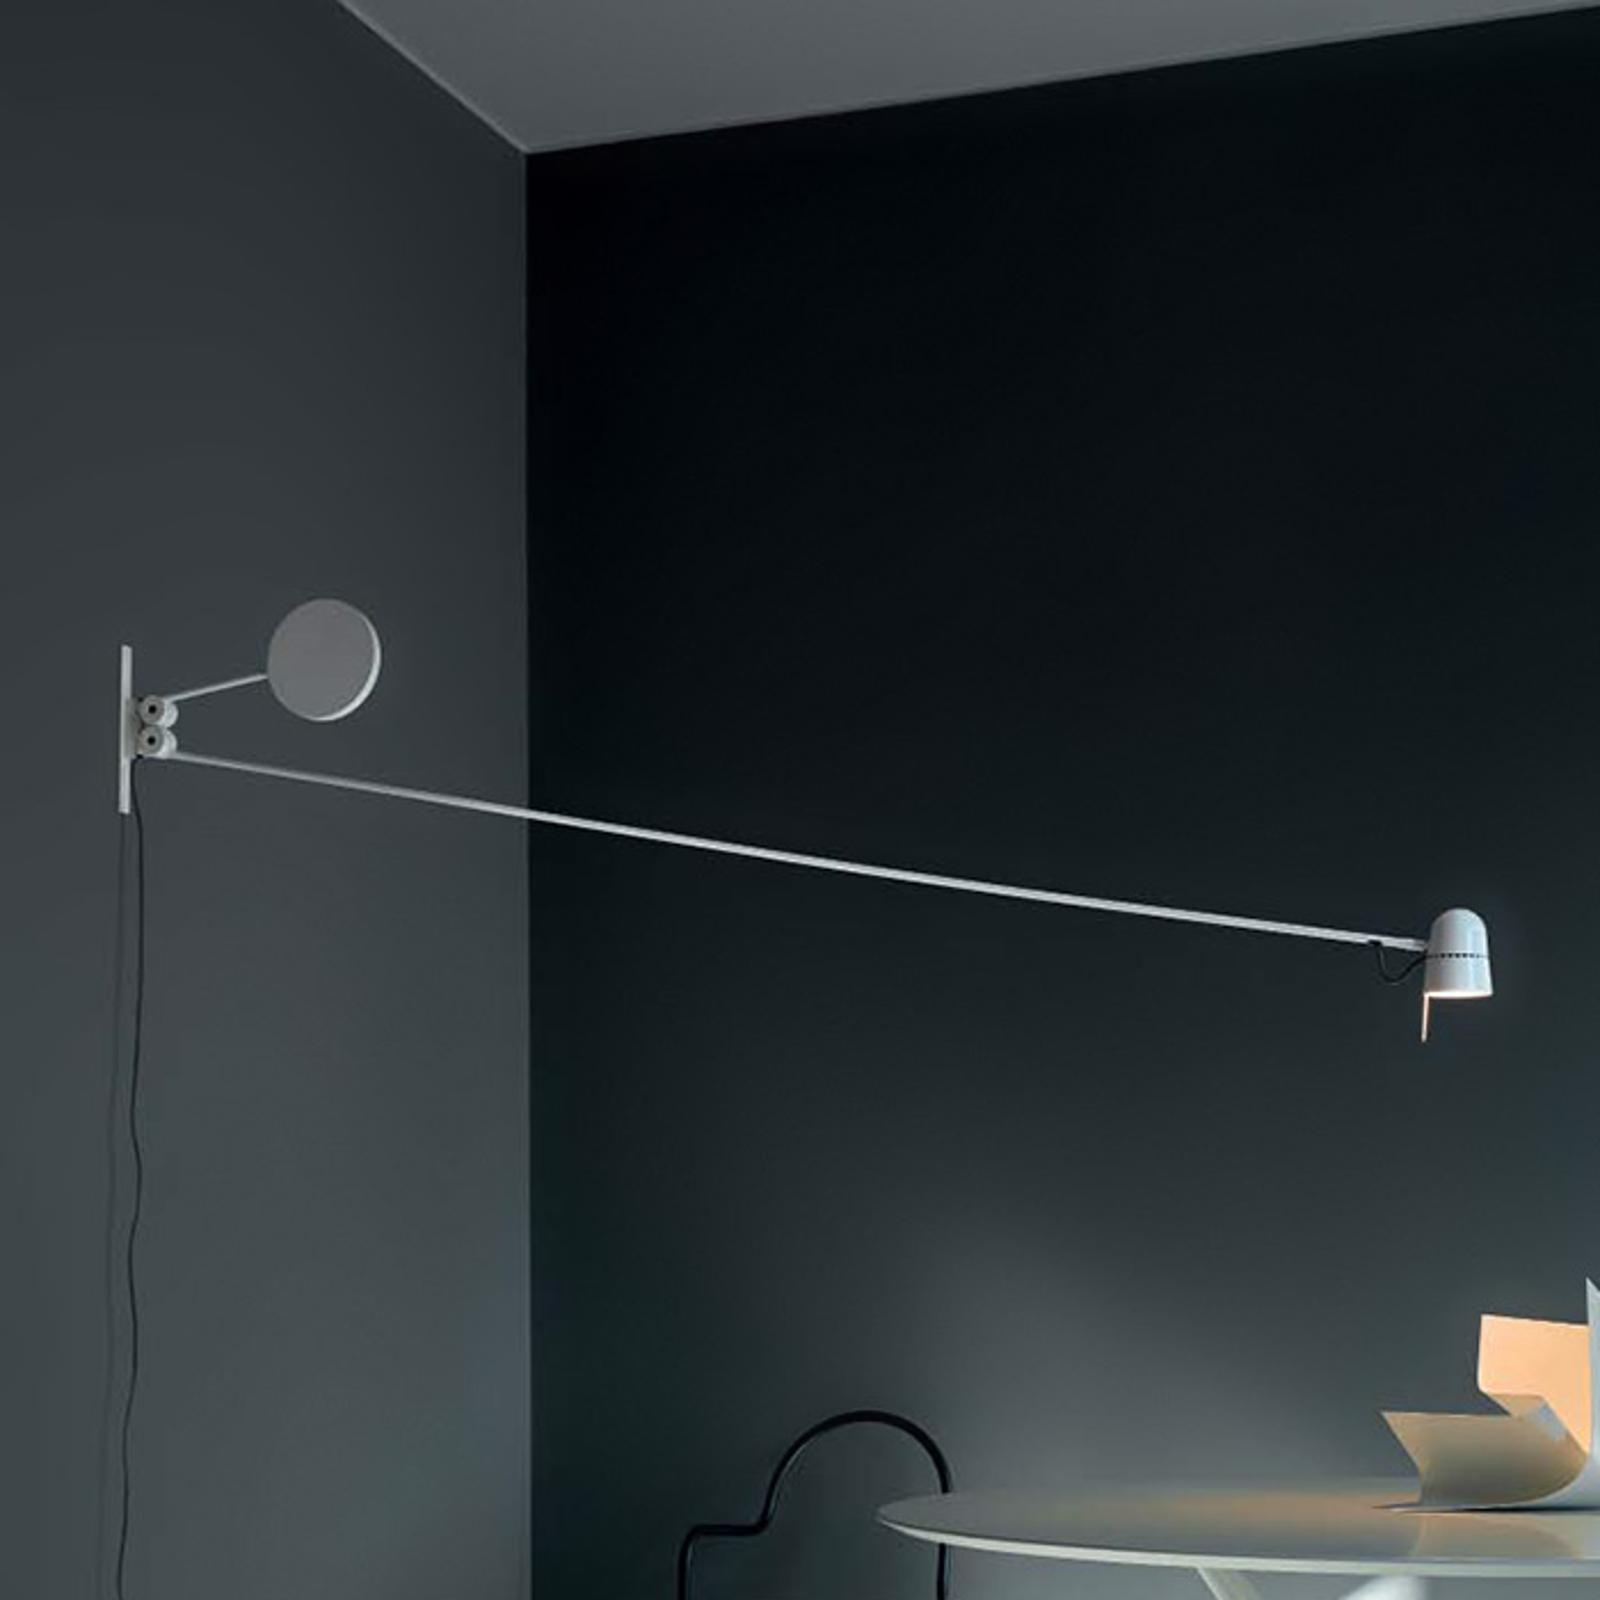 Stravagante applique LED Counterbalance, bianca